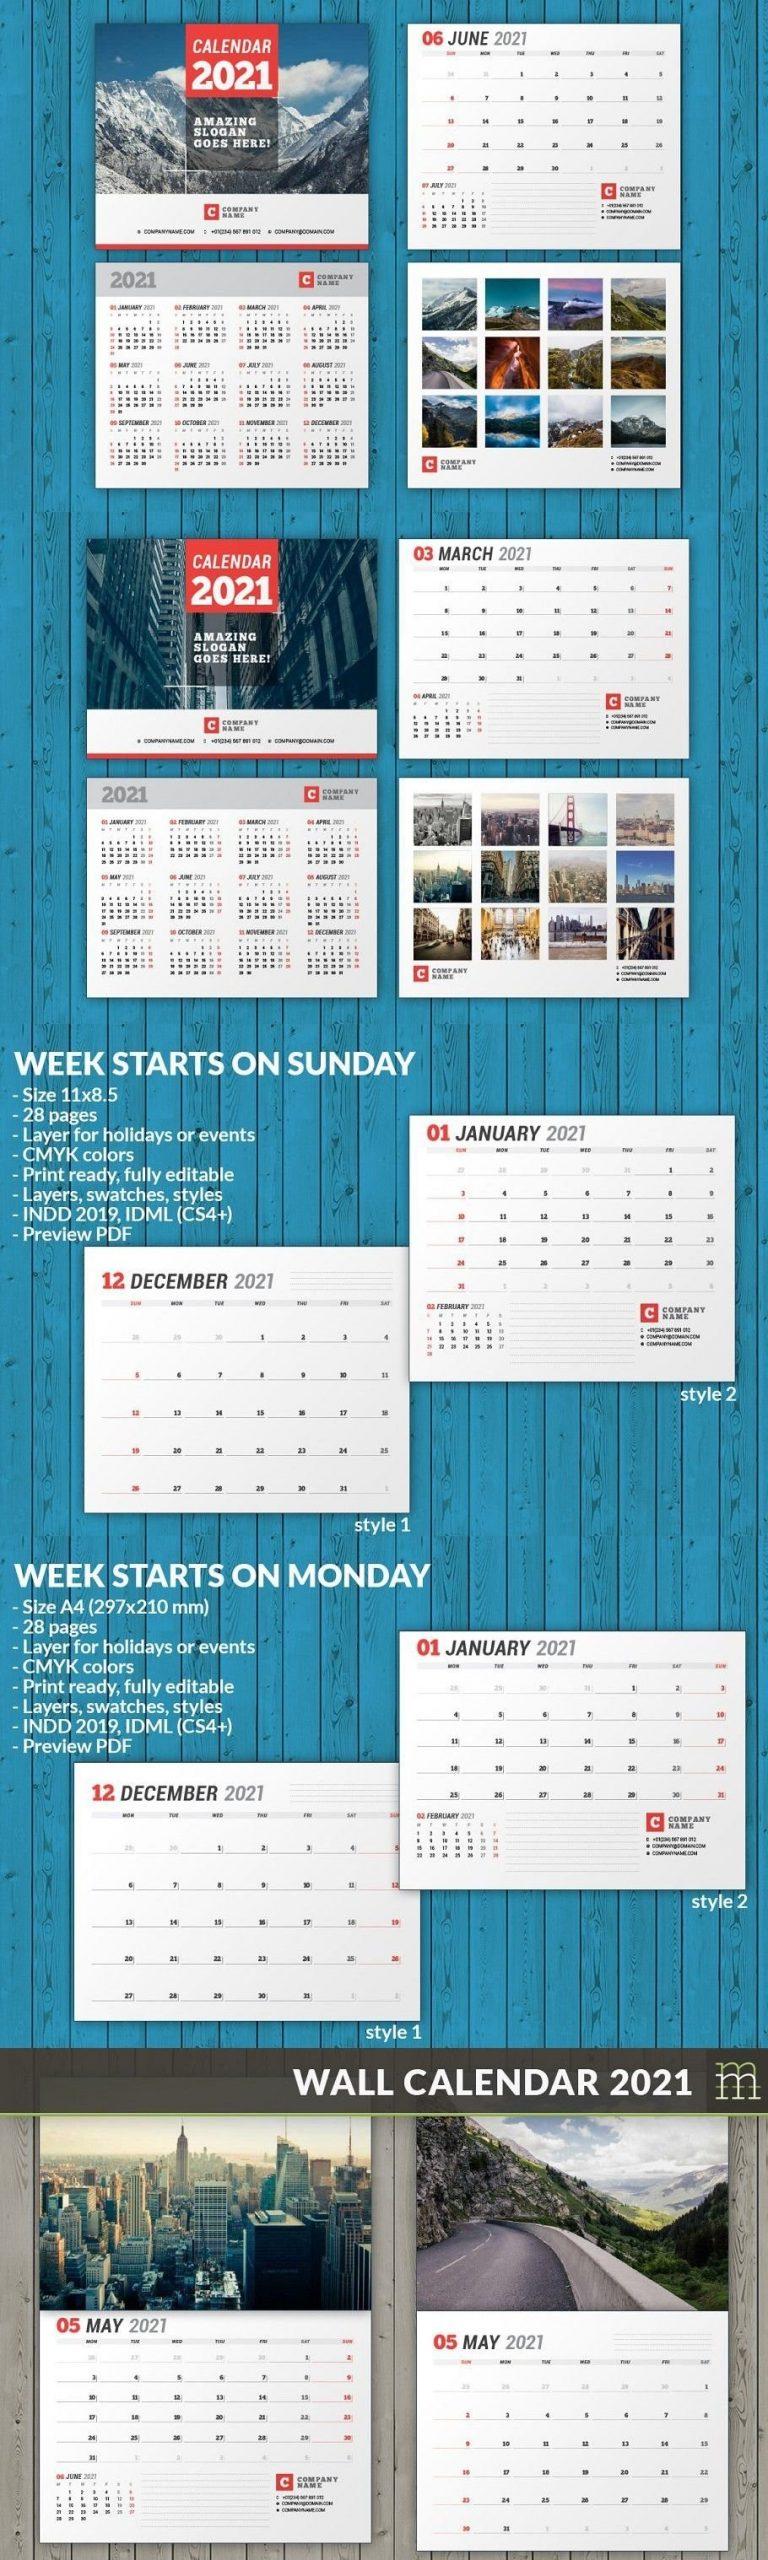 Wall Calendar 2021 (Wc037-21) In 2020   Wall Calendar, Calendar Template, Calendar 2020 intended for Indesign Calendar Template 2021 Graphics